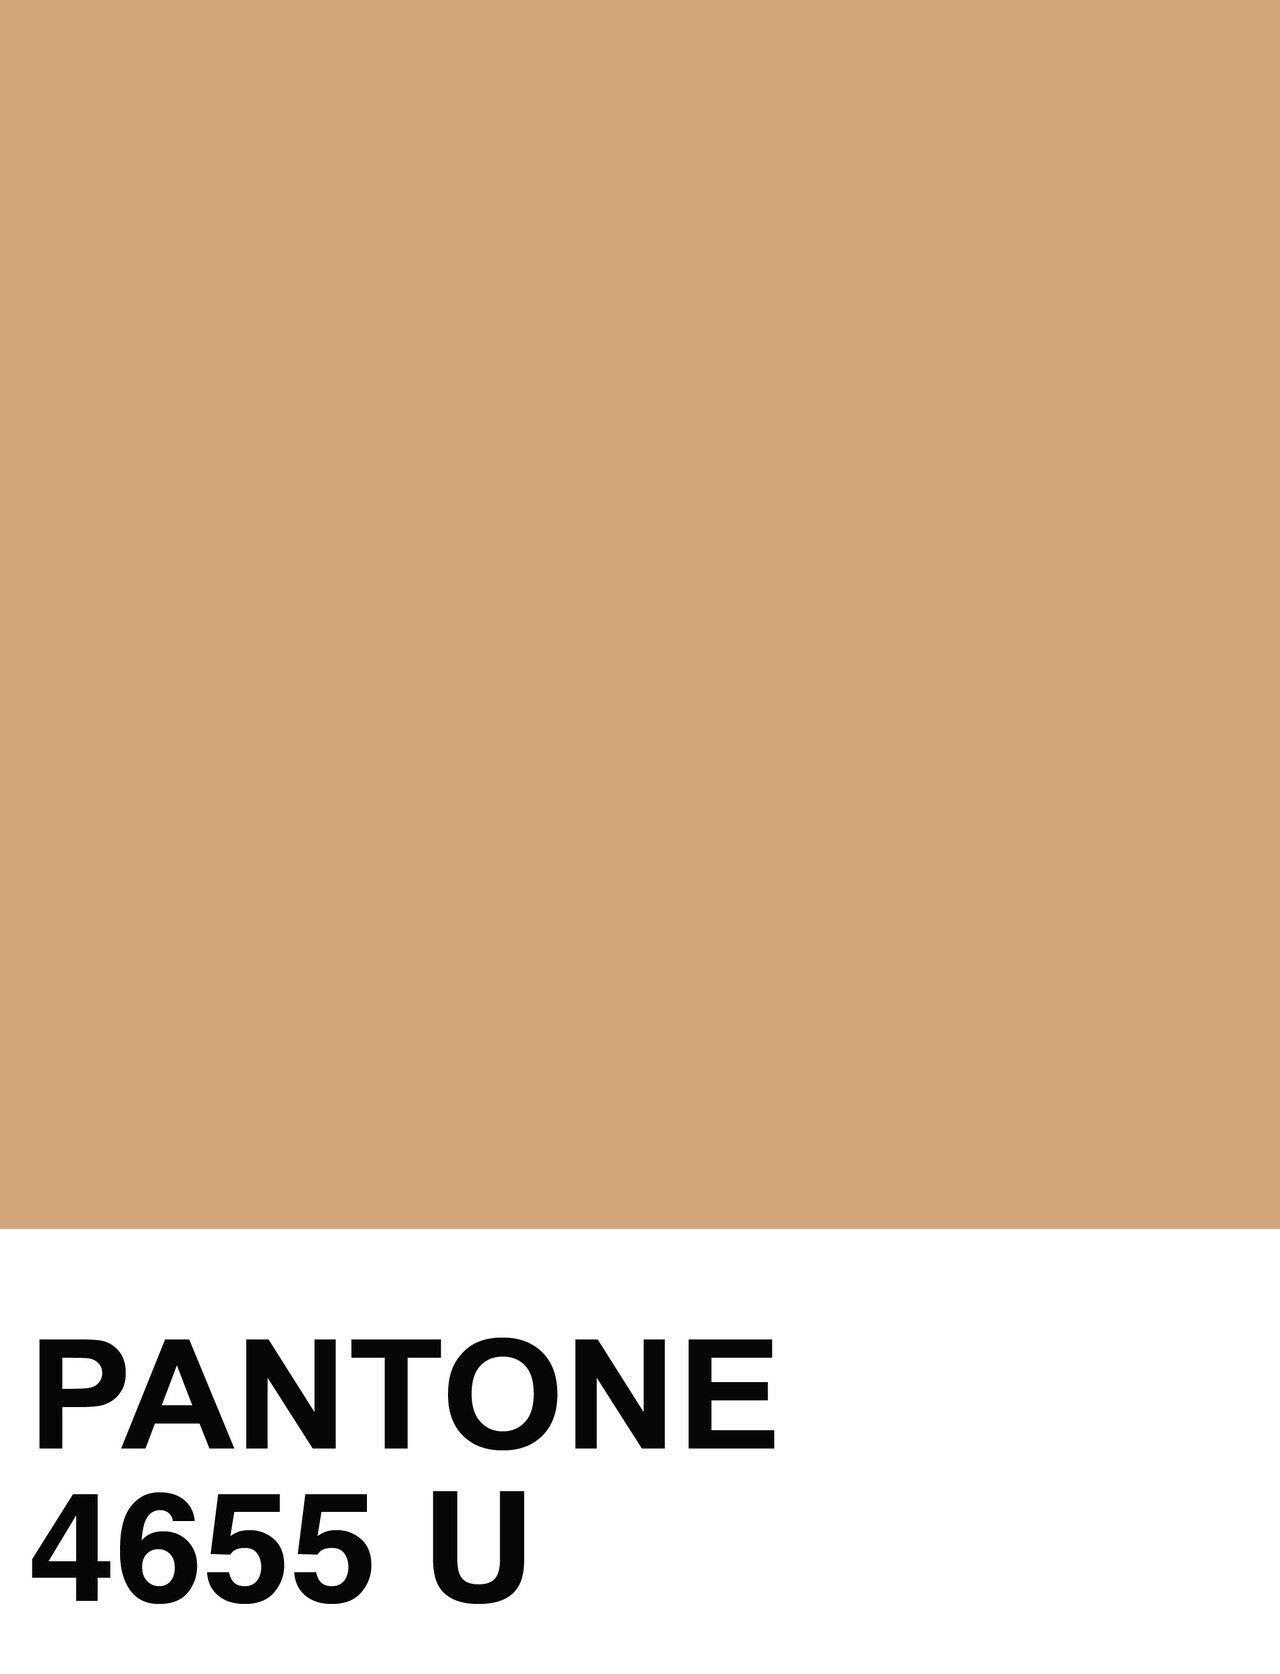 Pin by Darby Kirkland on Color Samplings | Pinterest